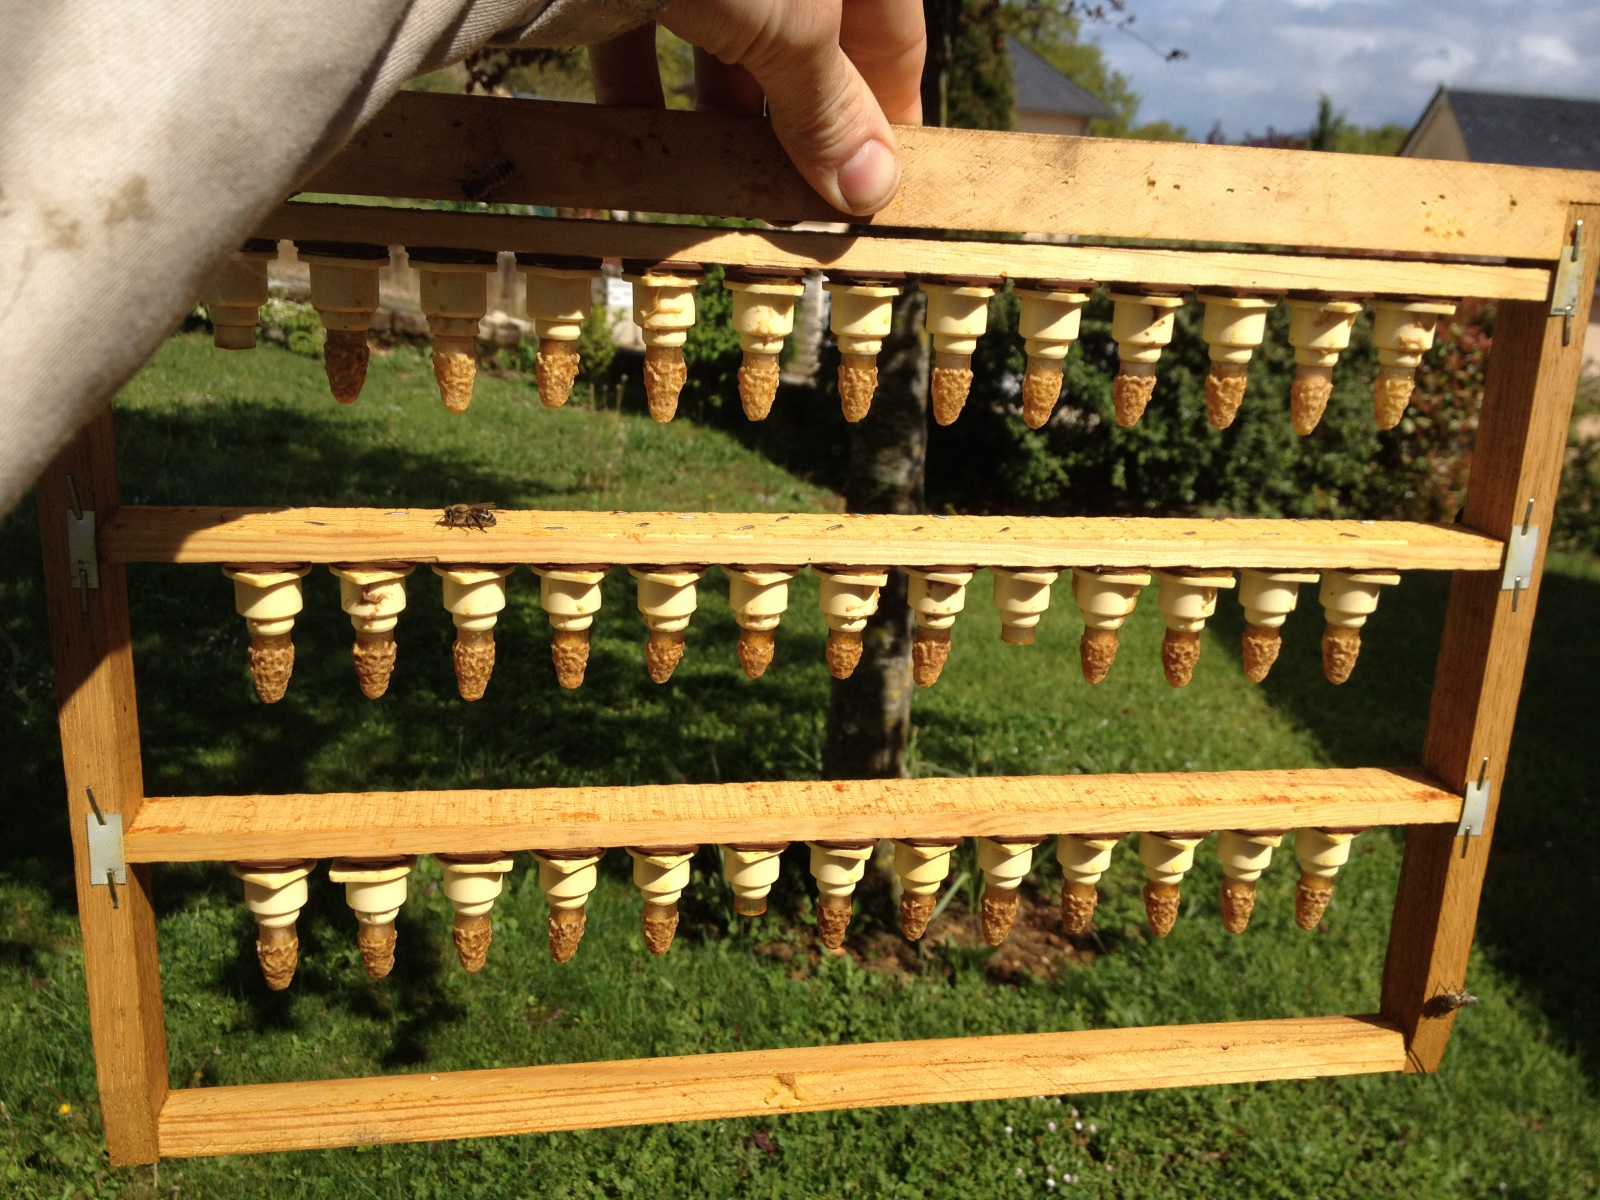 elevage de reines d 39 abeilles. Black Bedroom Furniture Sets. Home Design Ideas